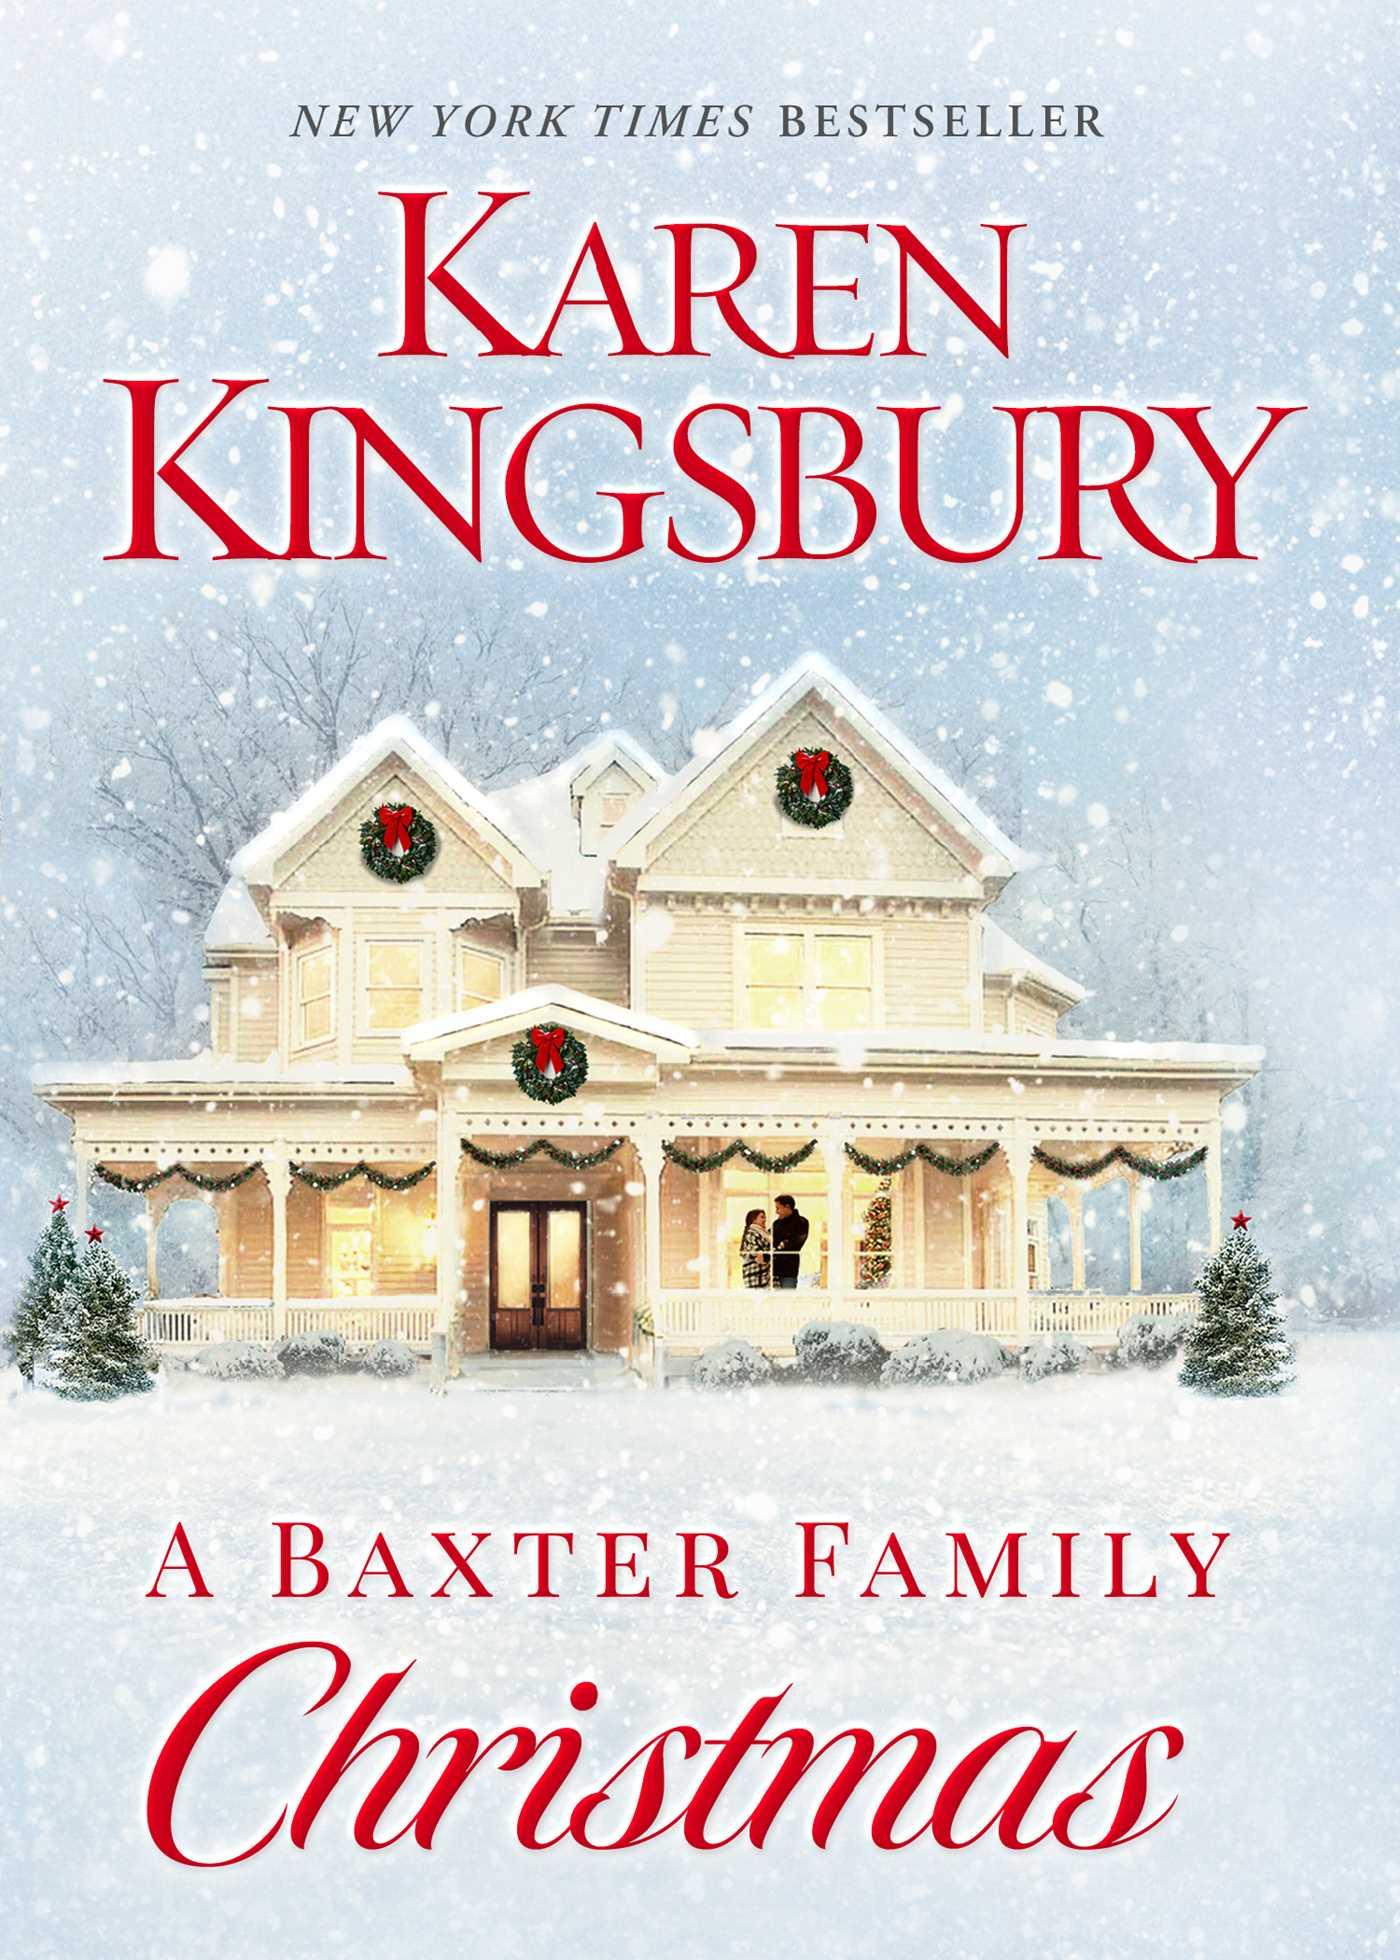 A baxter family christmas 9781451687576 hr